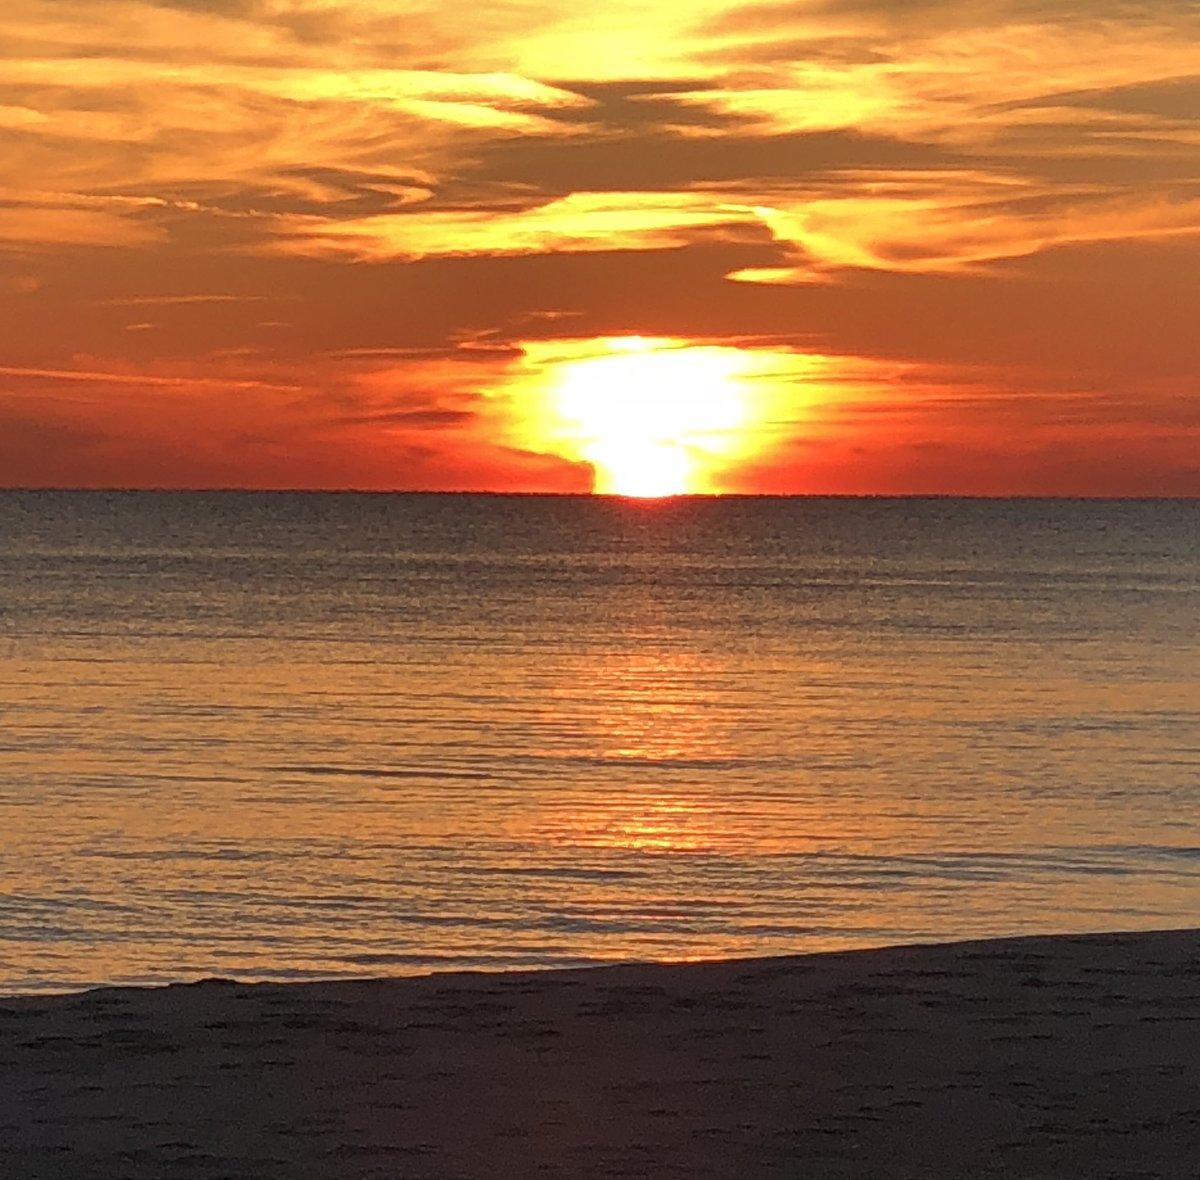 Sunset Panama City Beach @spann @CharlesDanielWx<br>http://pic.twitter.com/PMdeL5cVph